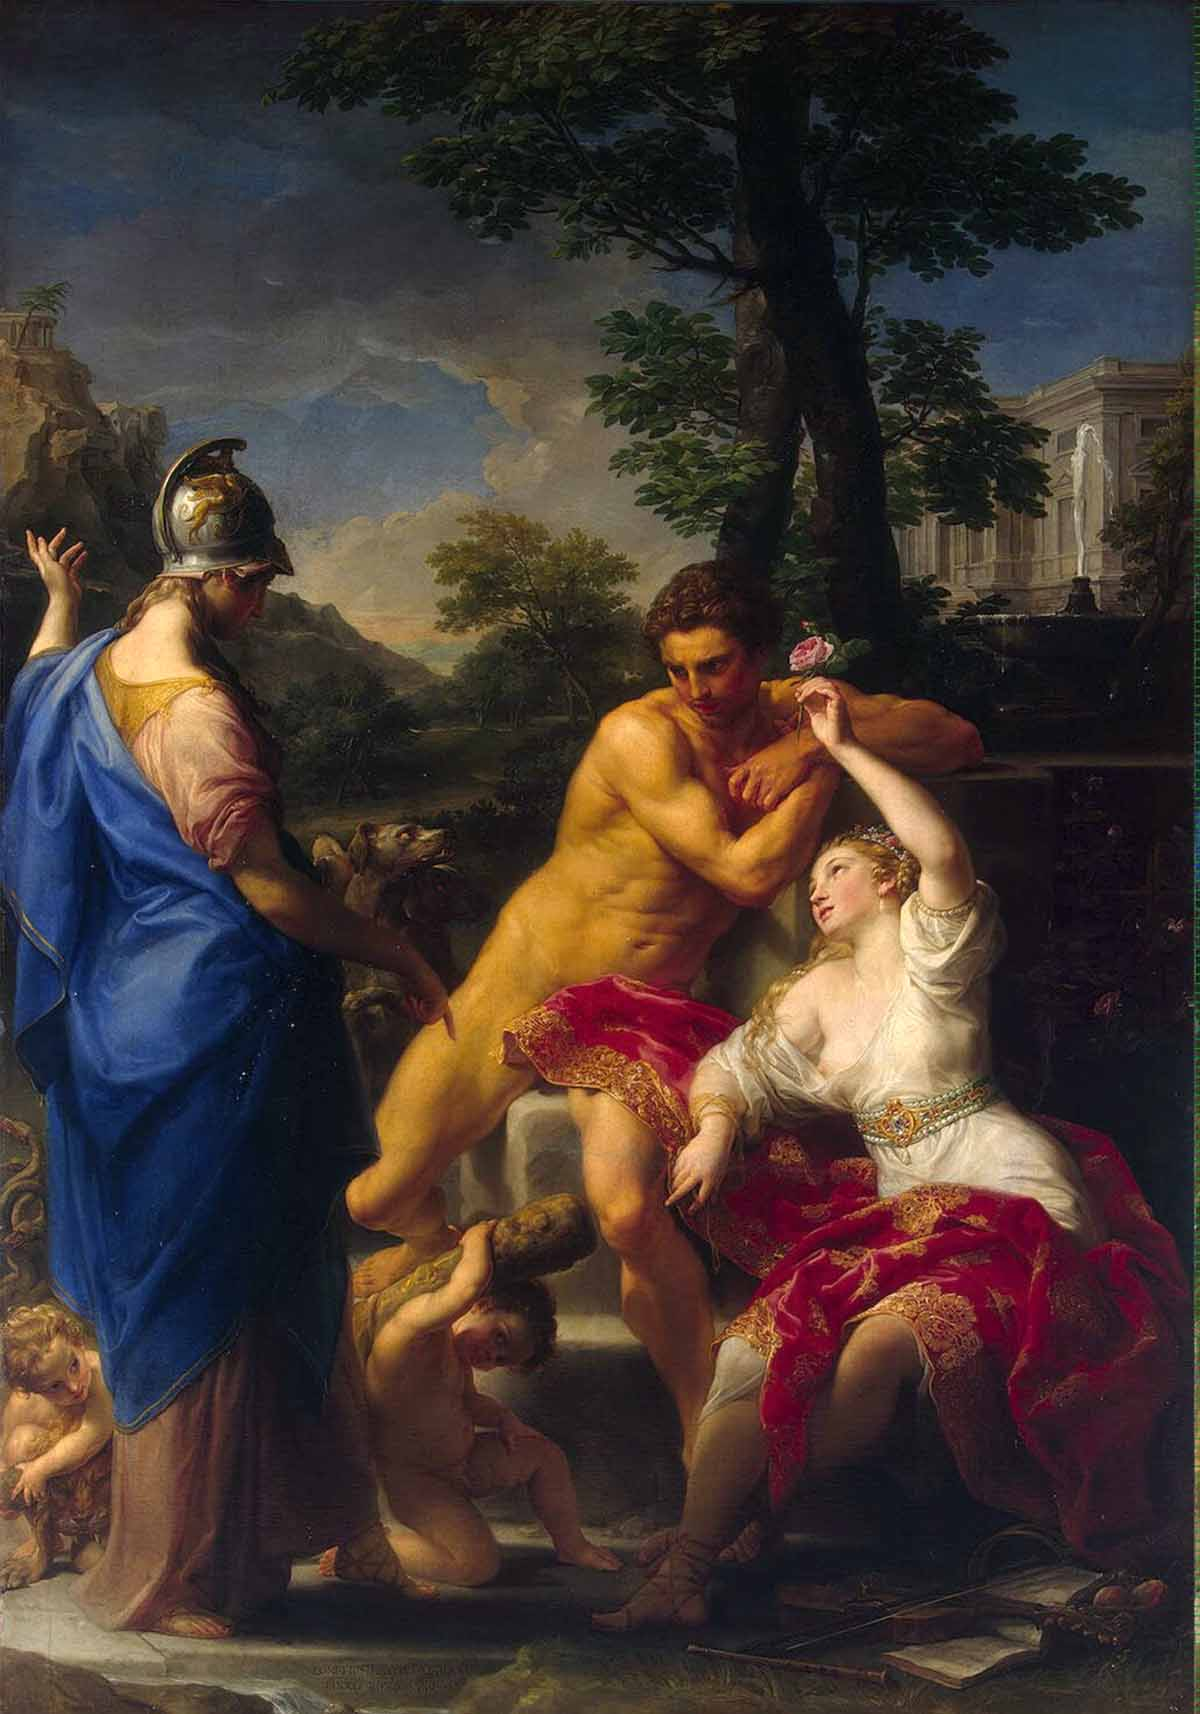 Erotic paintings of andrzej malinowski - 1 2